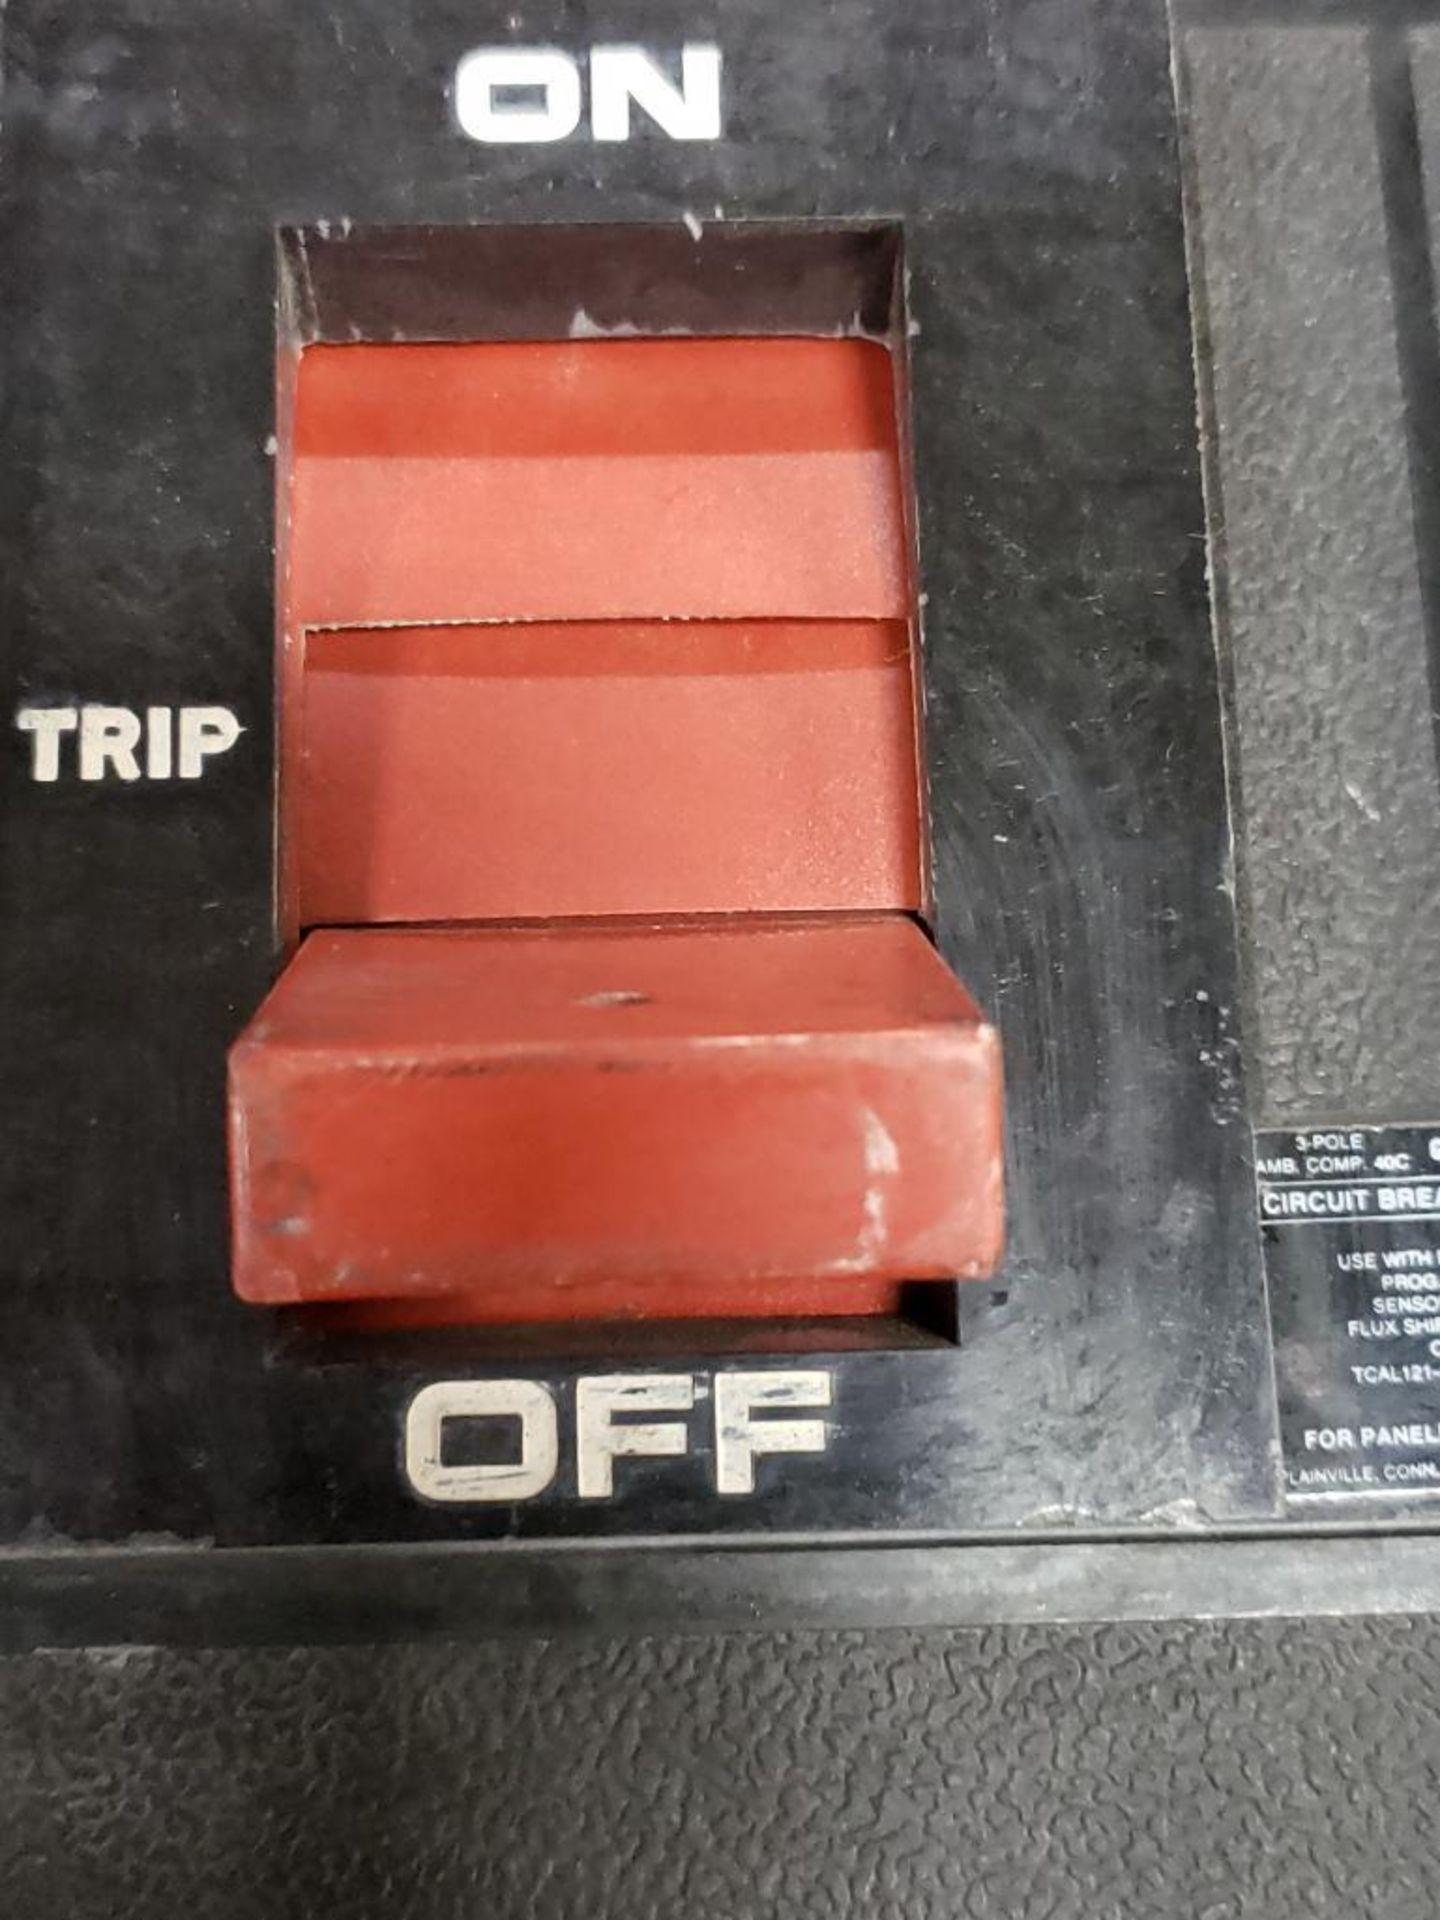 GE Micro Versa Trip T9VT20 Breaker. 1200Amp, 3-Pole. - Image 5 of 6